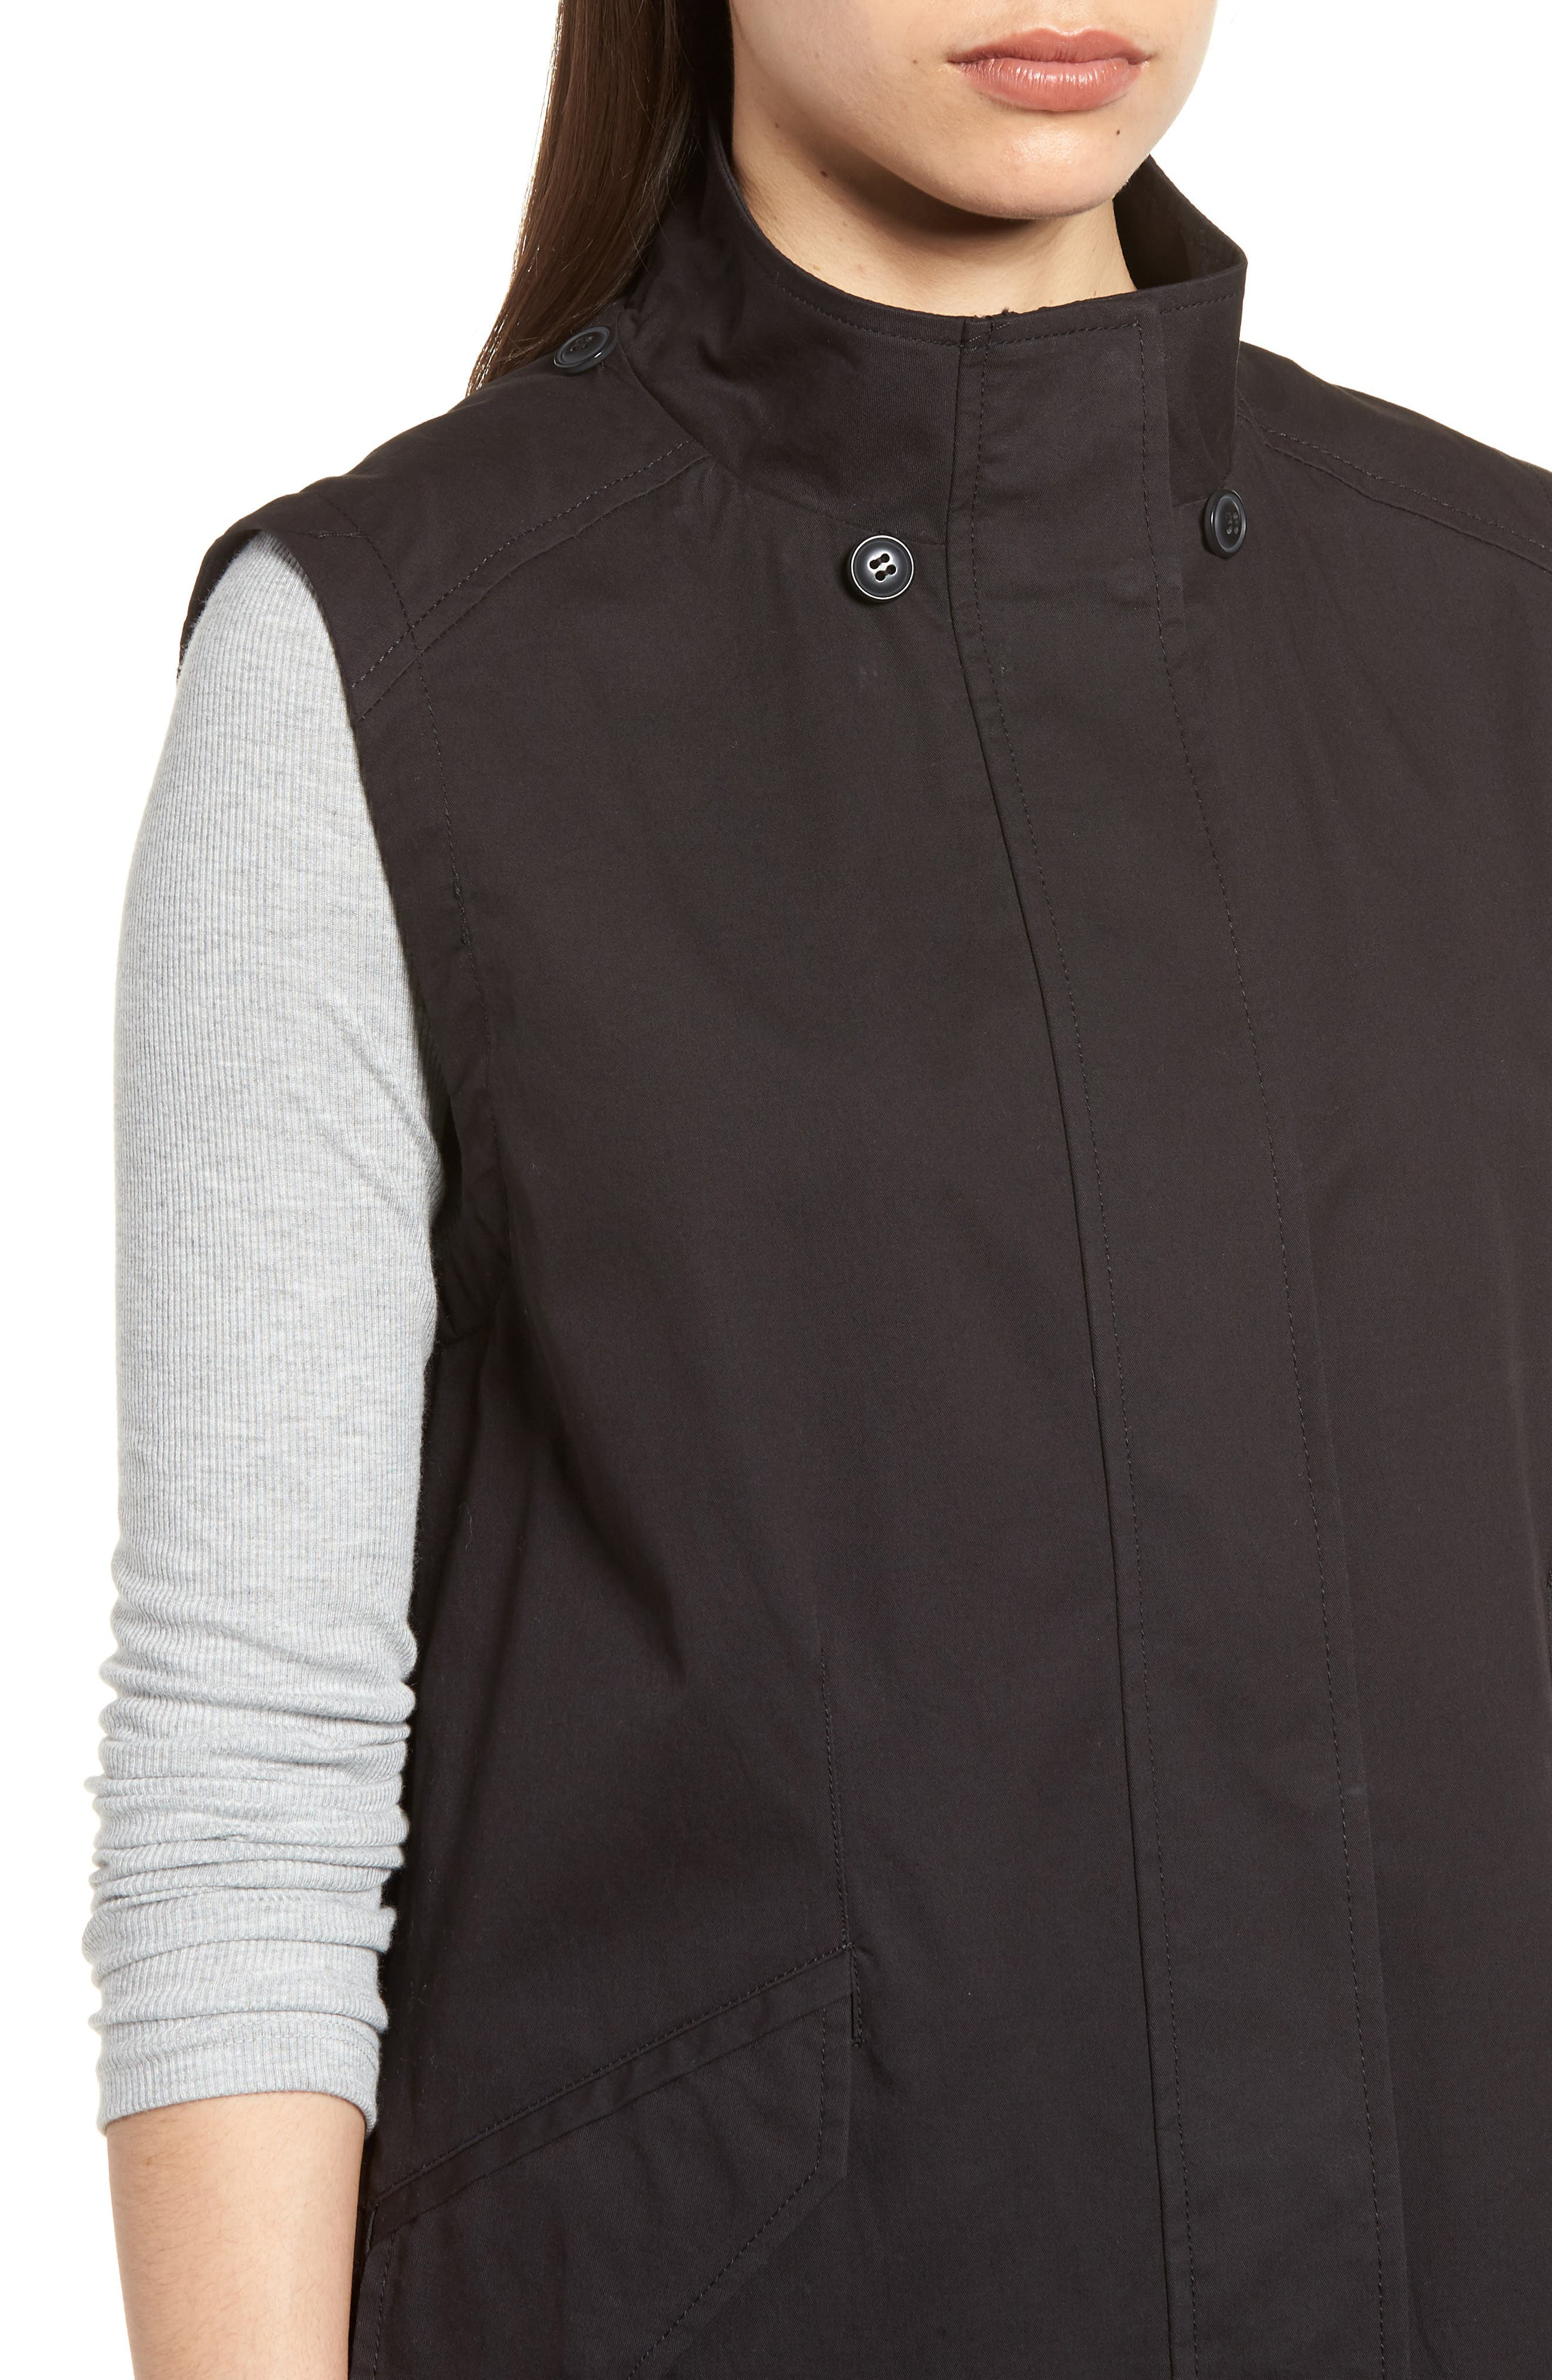 Elongated Hooded Vest,                             Alternate thumbnail 4, color,                             001